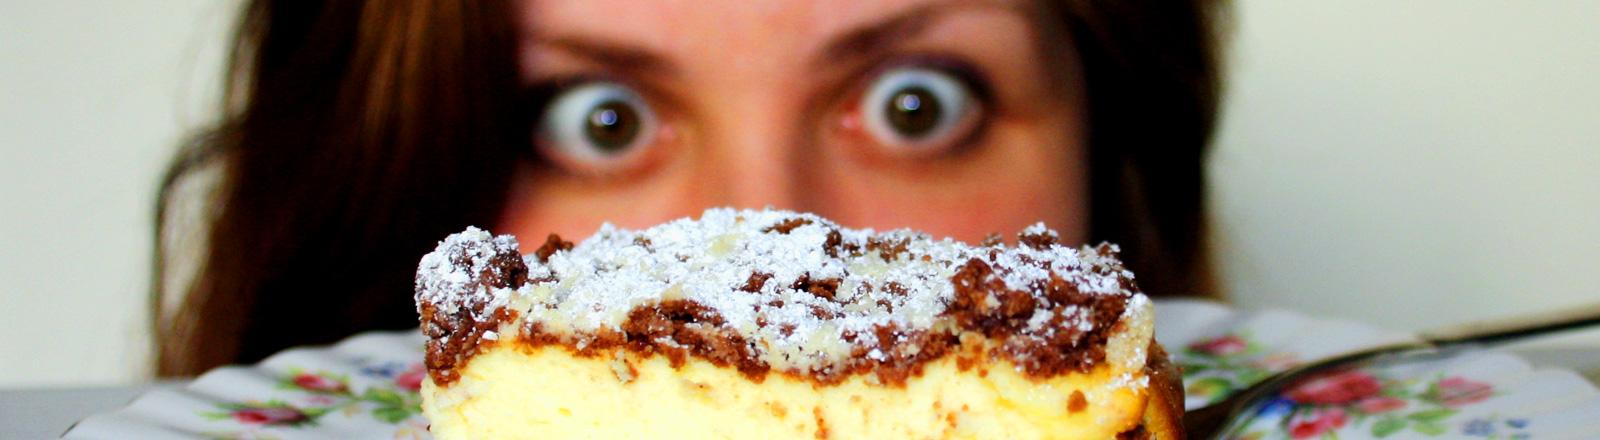 Frau starrt hungrig auf Kuchenstück